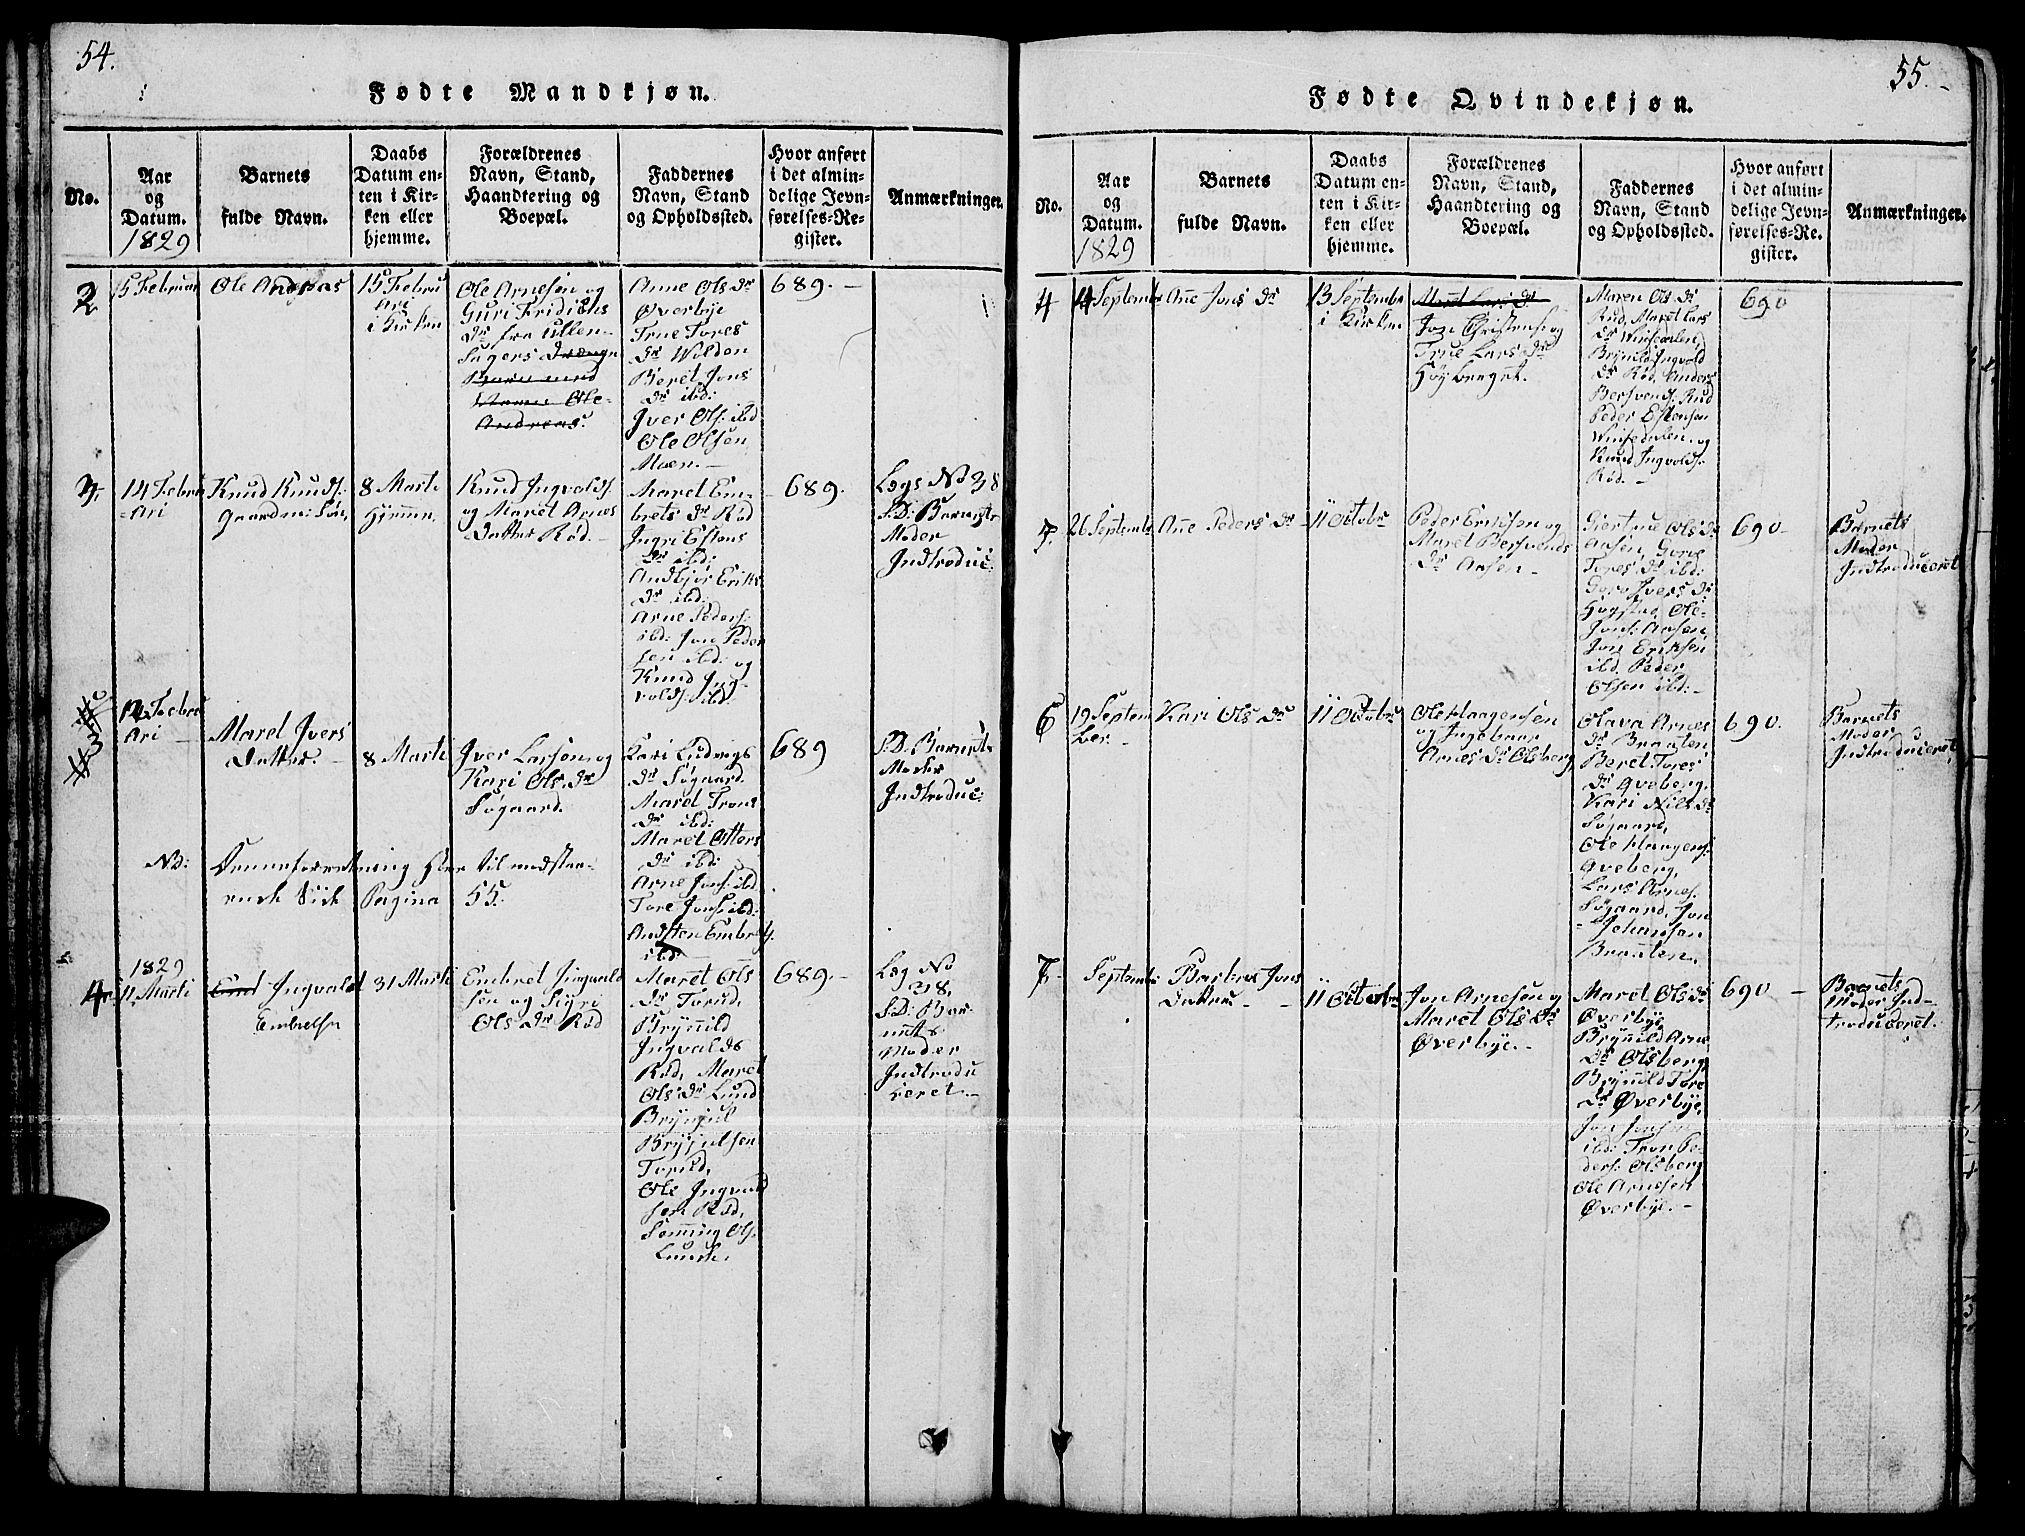 SAH, Tynset prestekontor, Klokkerbok nr. 4, 1814-1879, s. 54-55